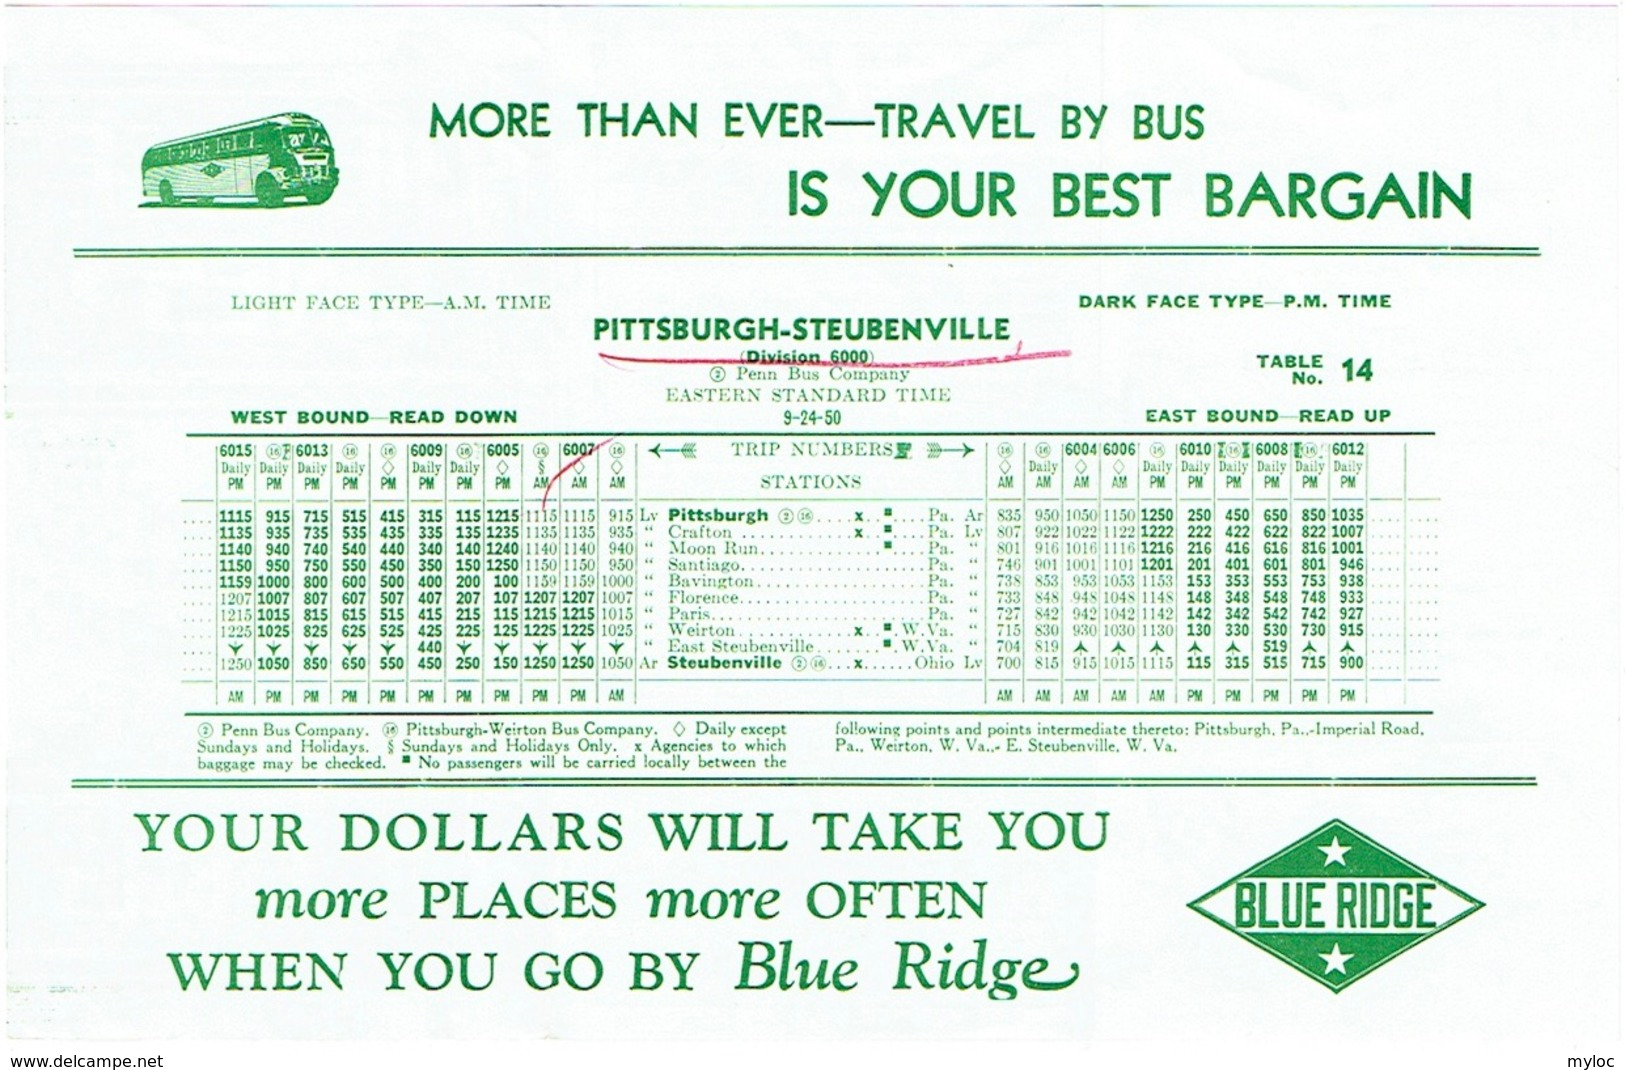 Horaire/Time Tables. Pittsburgh/Steubenville. 1950. Bus Blue Ridge Lines. Autobus. - World